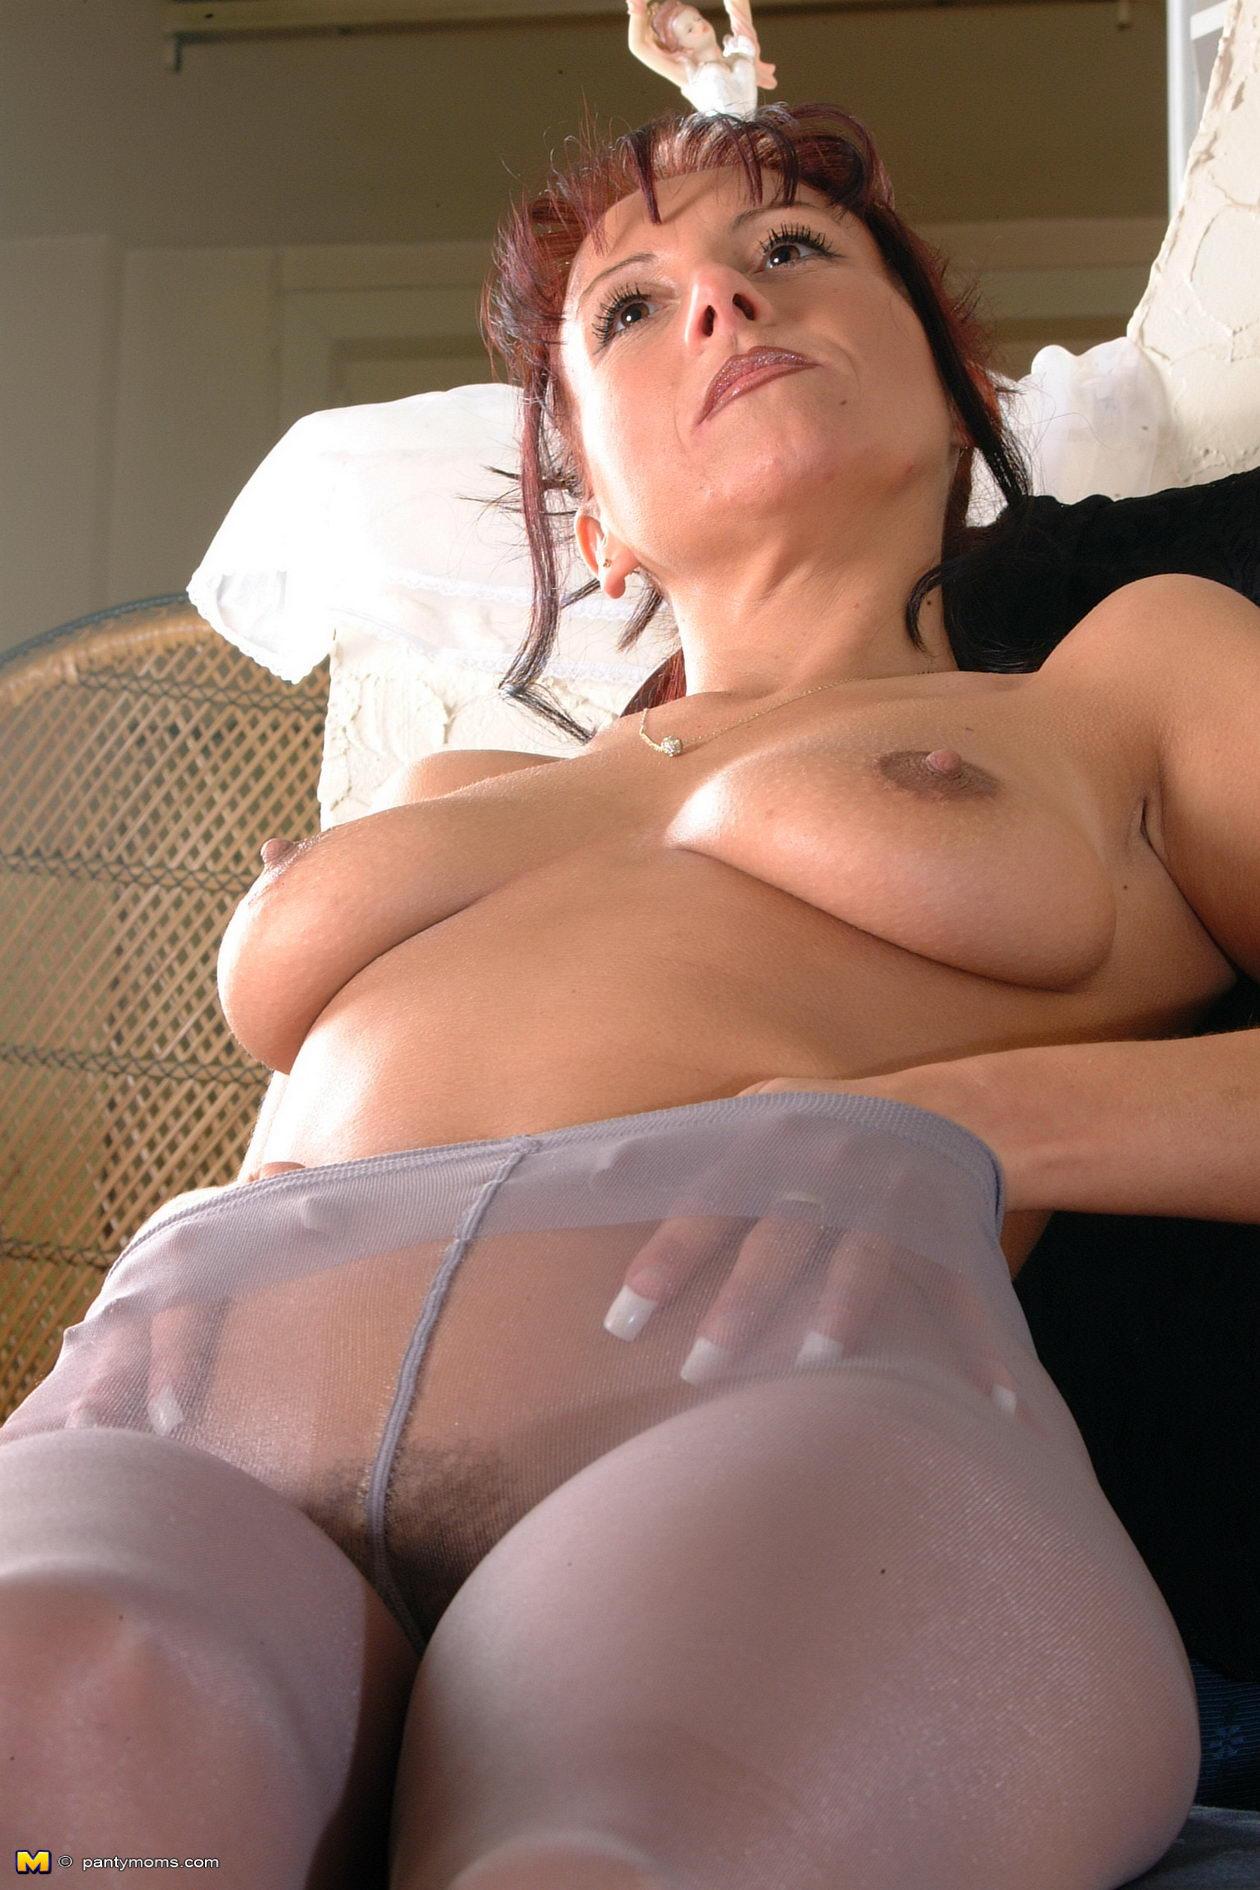 Hose mature pantie video 7271